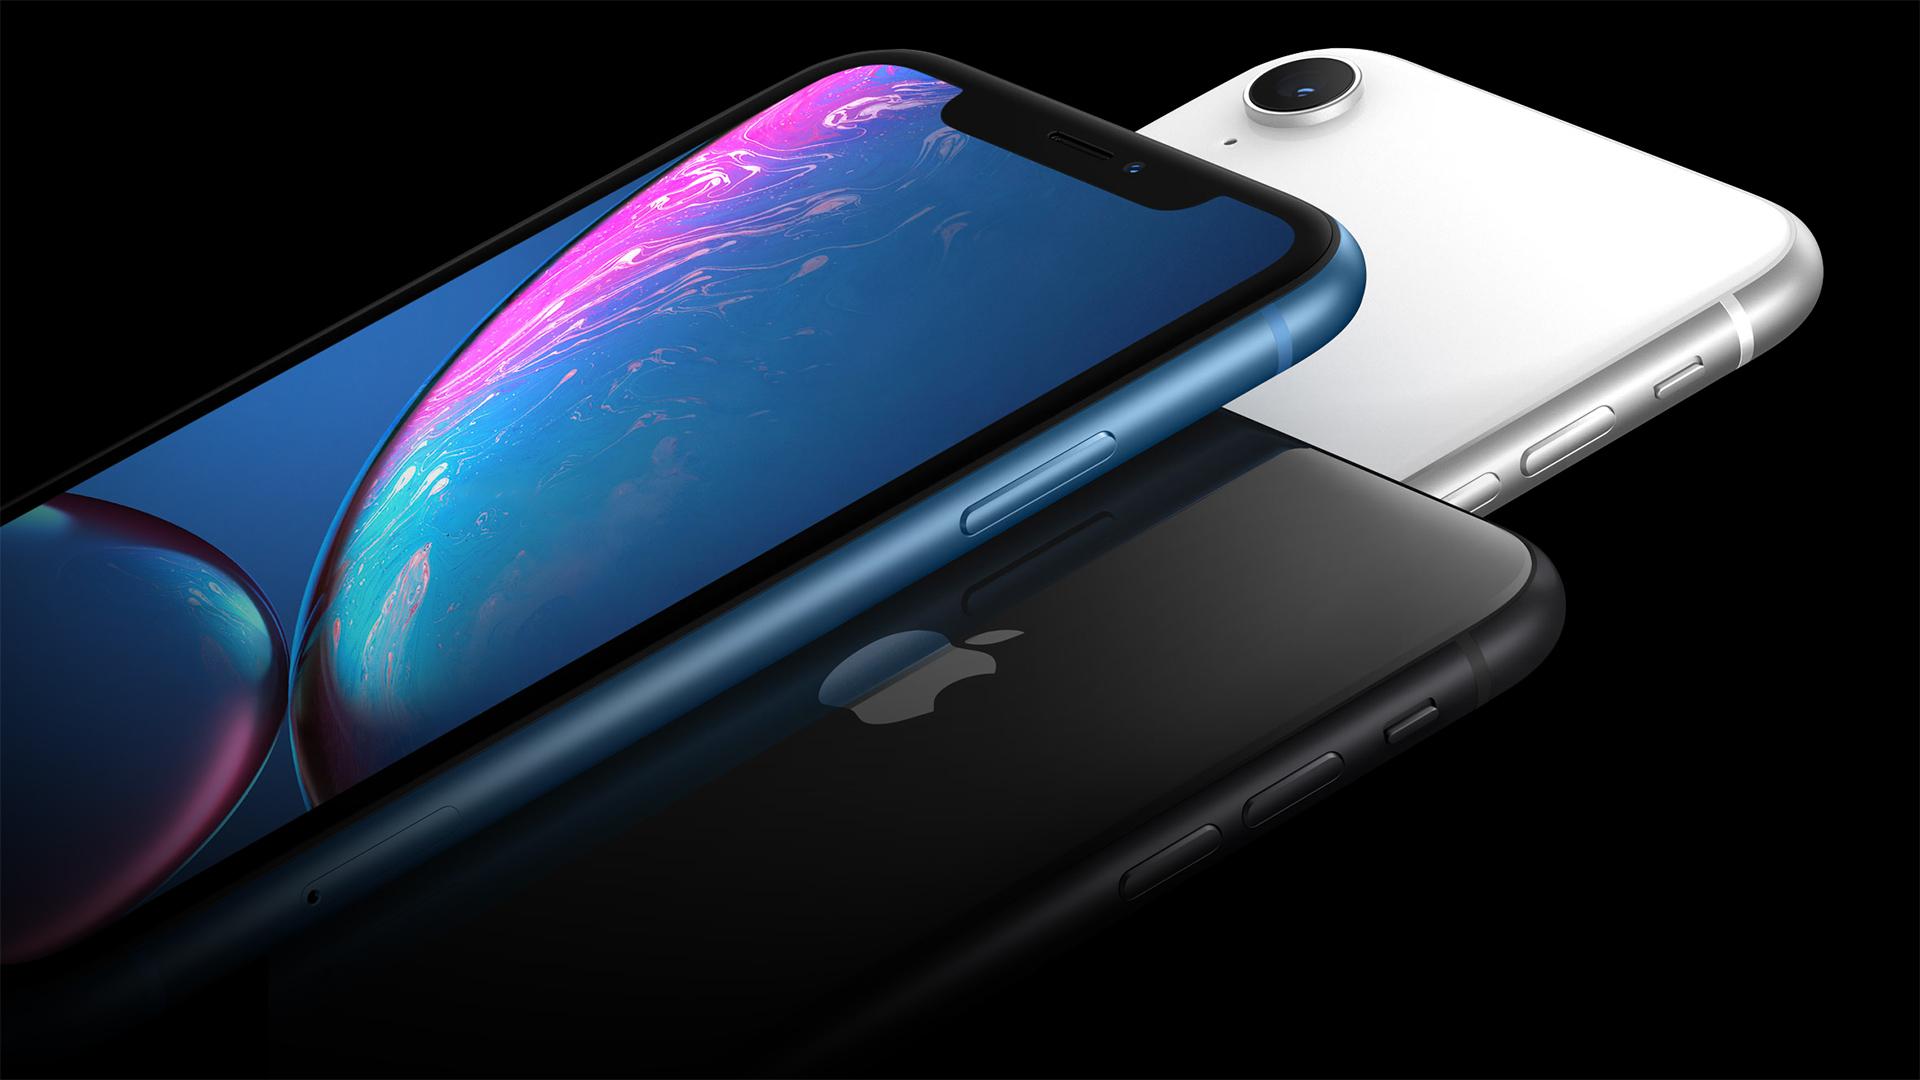 Image: Apple.